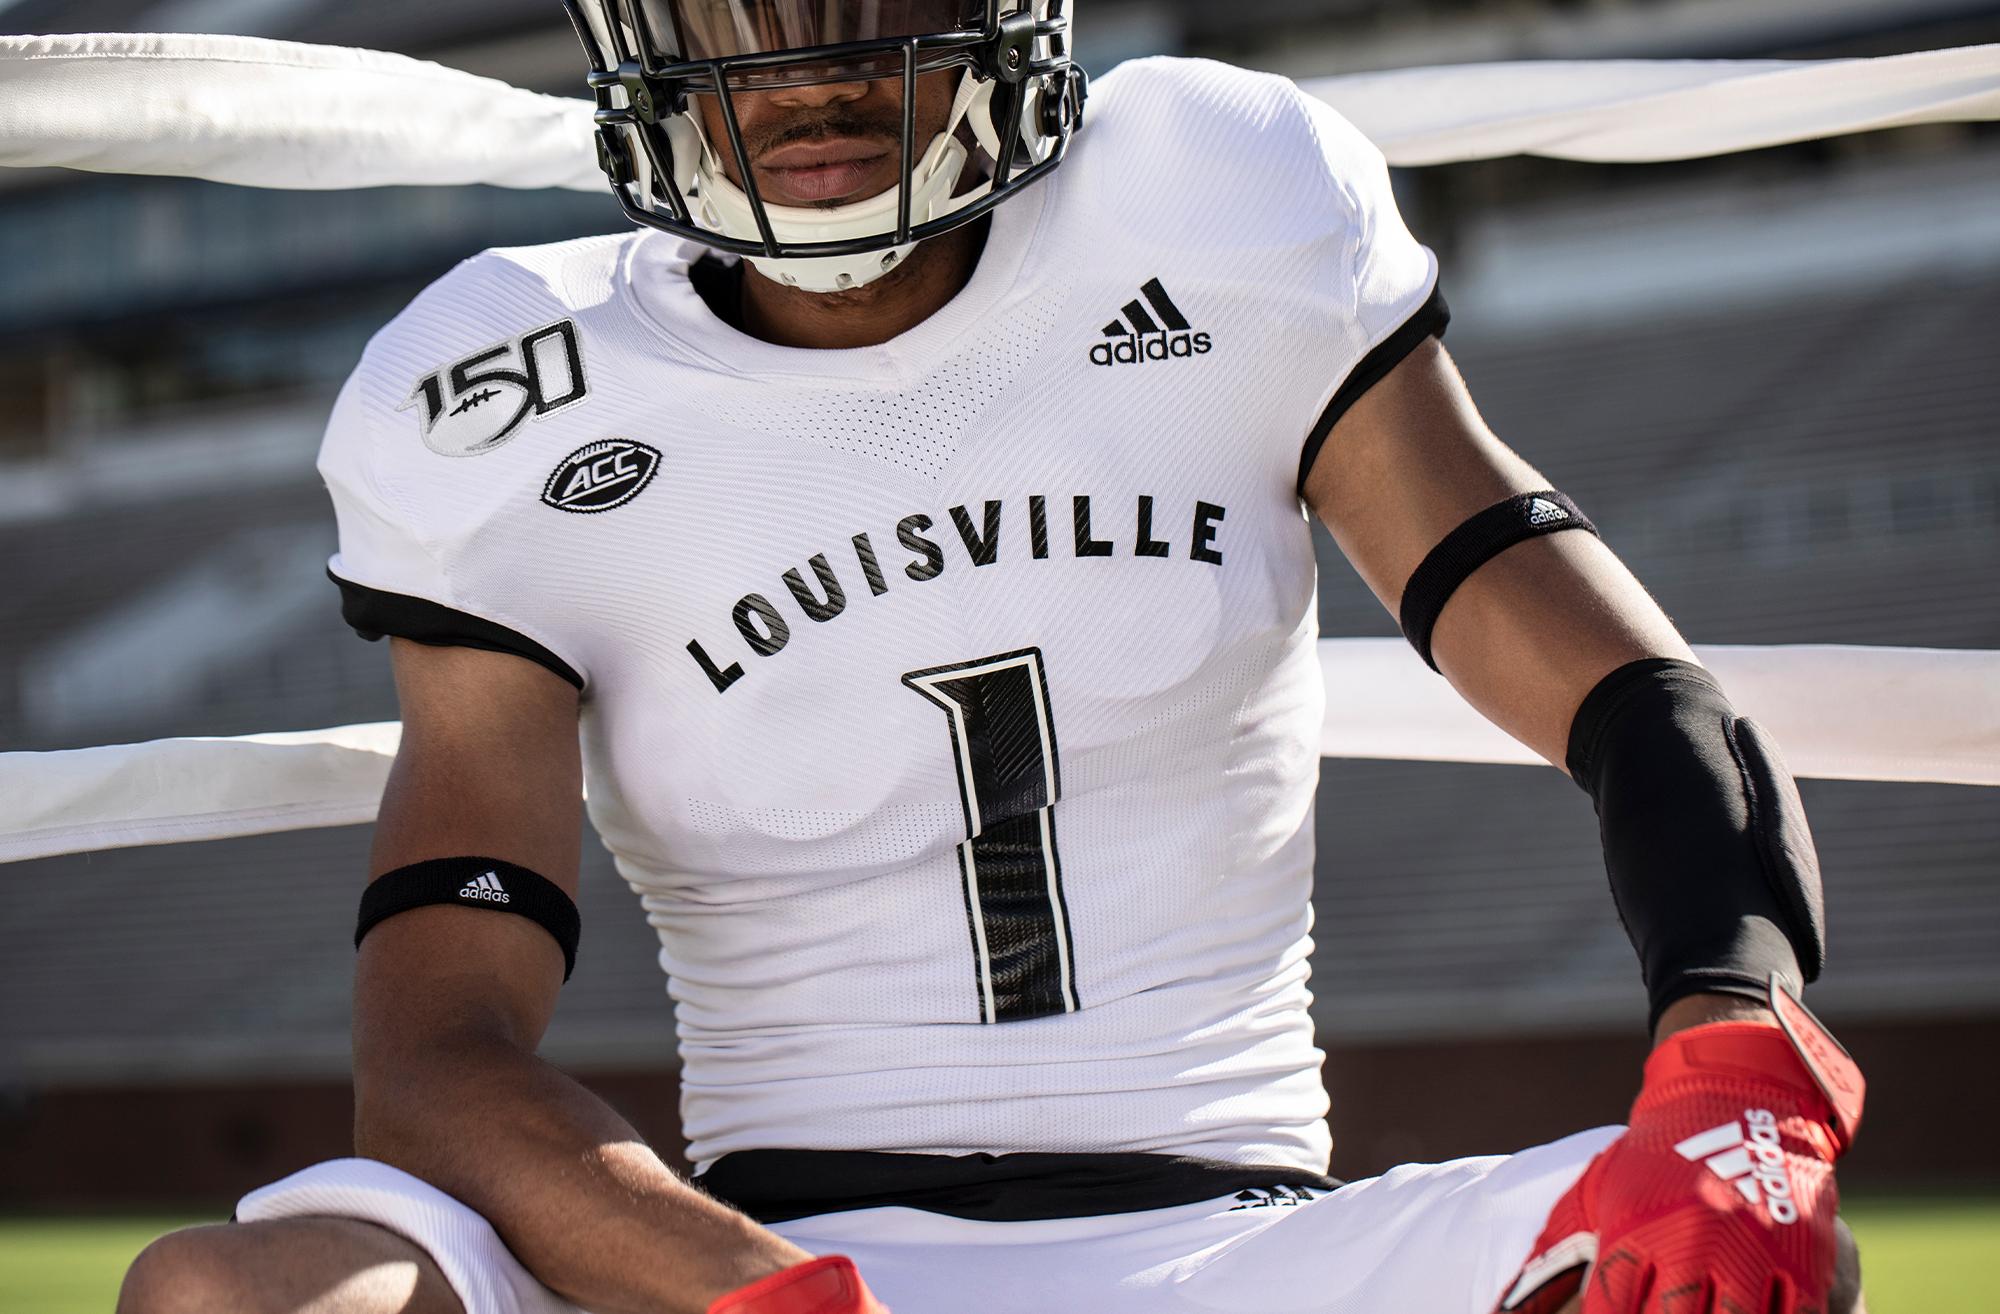 quality design 2dea2 93b61 Photos Of Louisville Football Muhammad Ali Inspired Uniforms ...